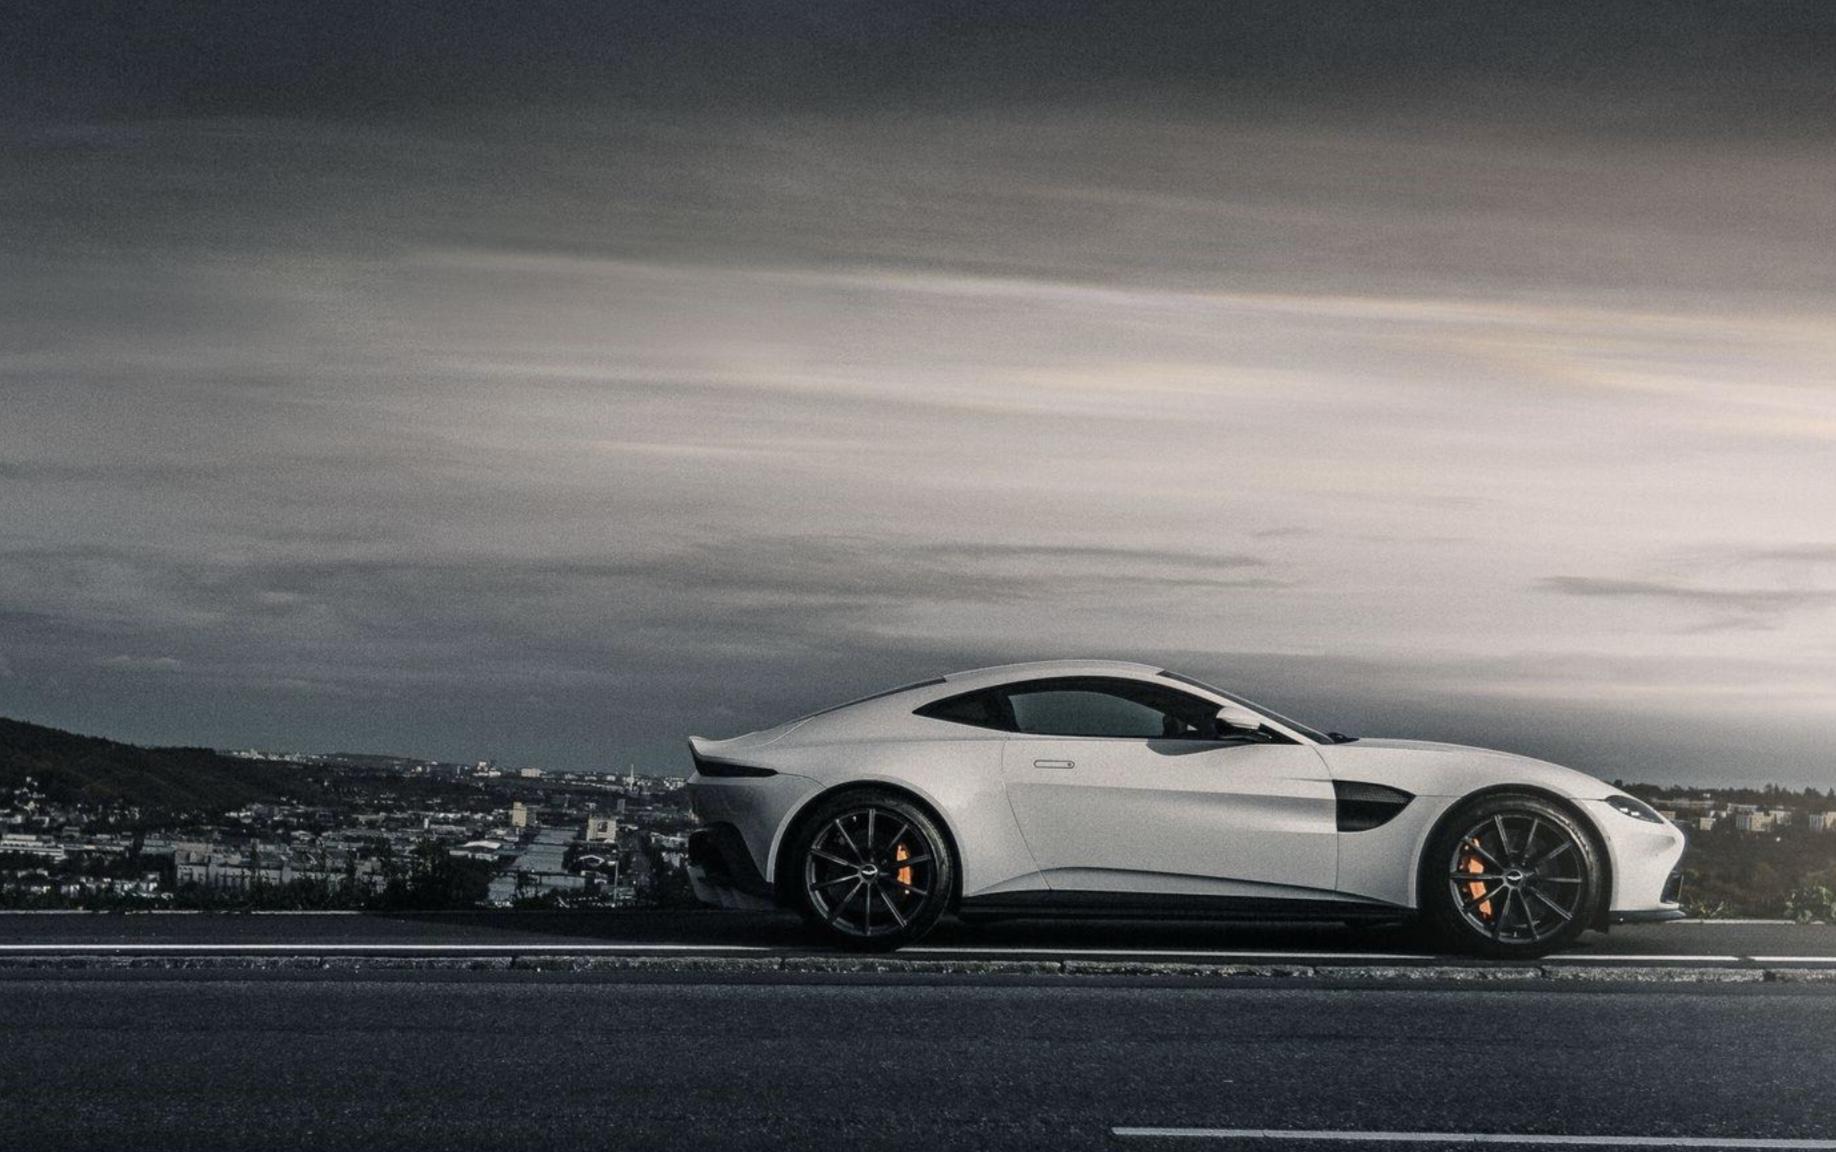 Aston Martin S Q4 Full Year 2020 Results Karenable